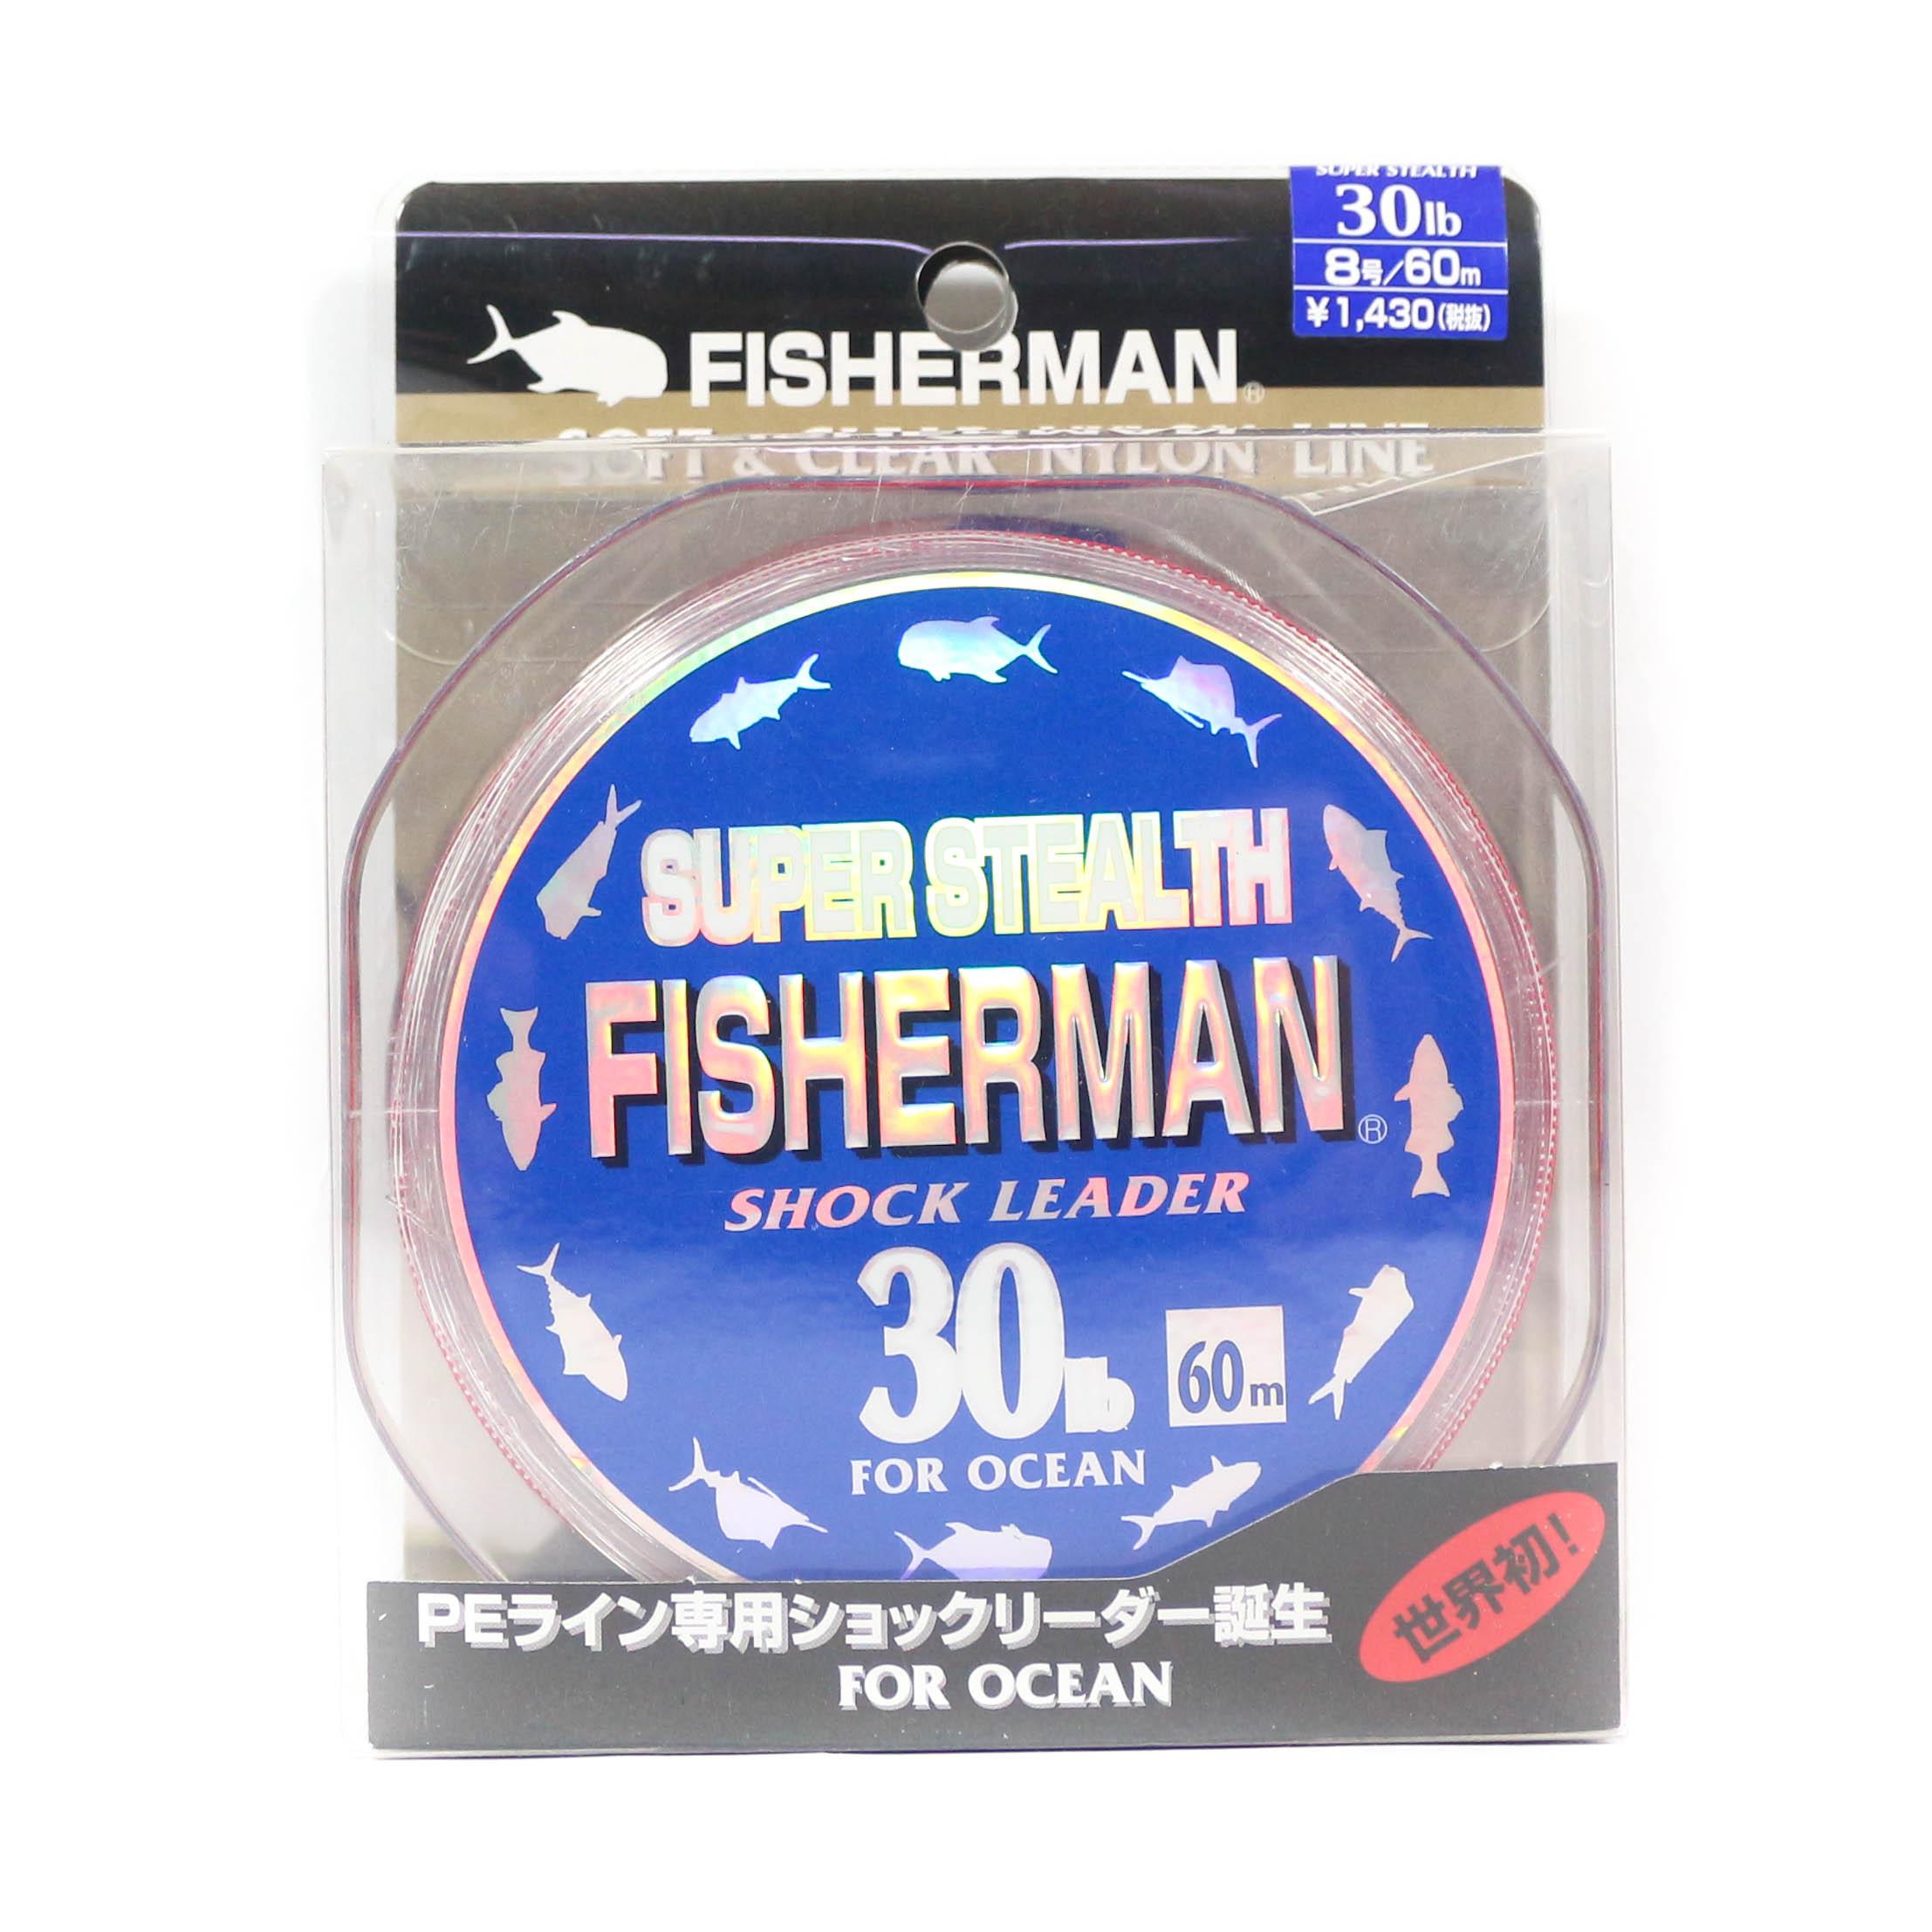 Fisherman Super Stealth Nylon Shock Leader 30 lb x 60 meter (0016)